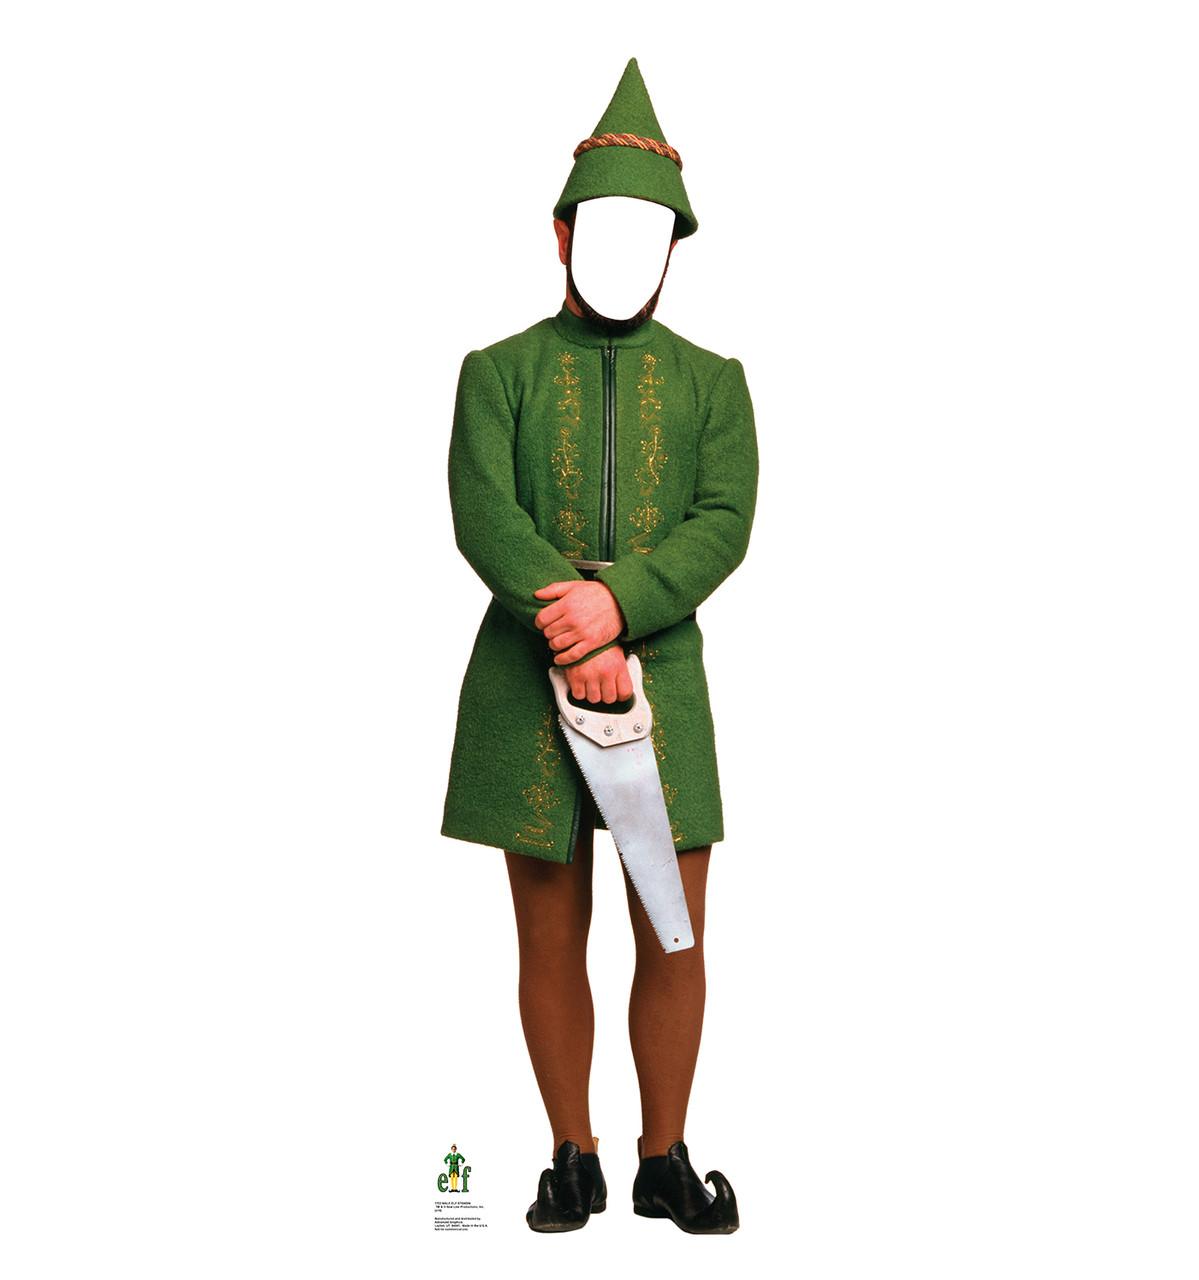 Life-size Male Elf Standin Cardboard Standup